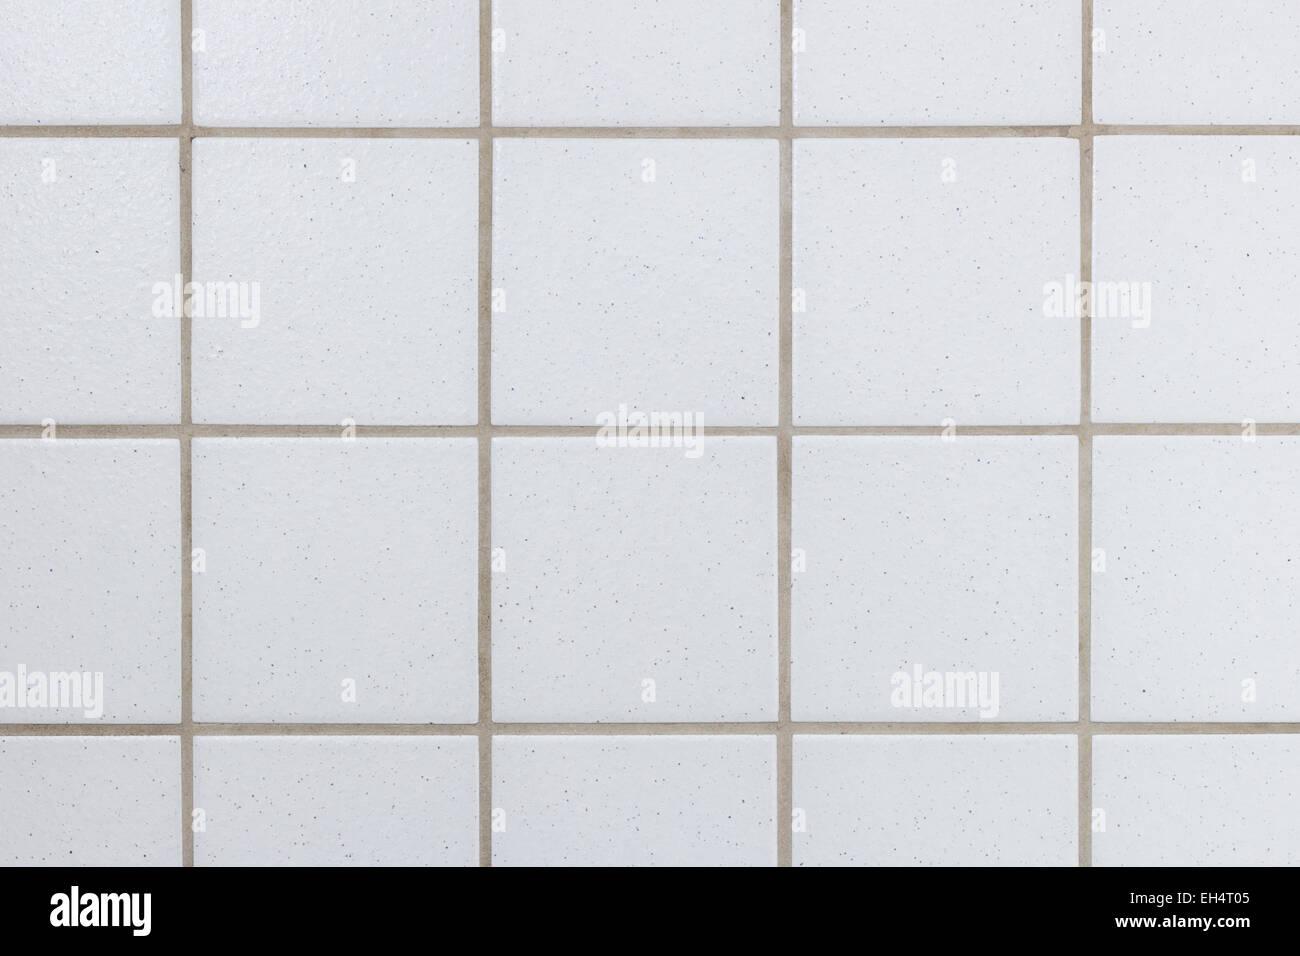 Closeup of a light greywhite ceramic tile wall texture stock closeup of a light greywhite ceramic tile wall texture dailygadgetfo Image collections